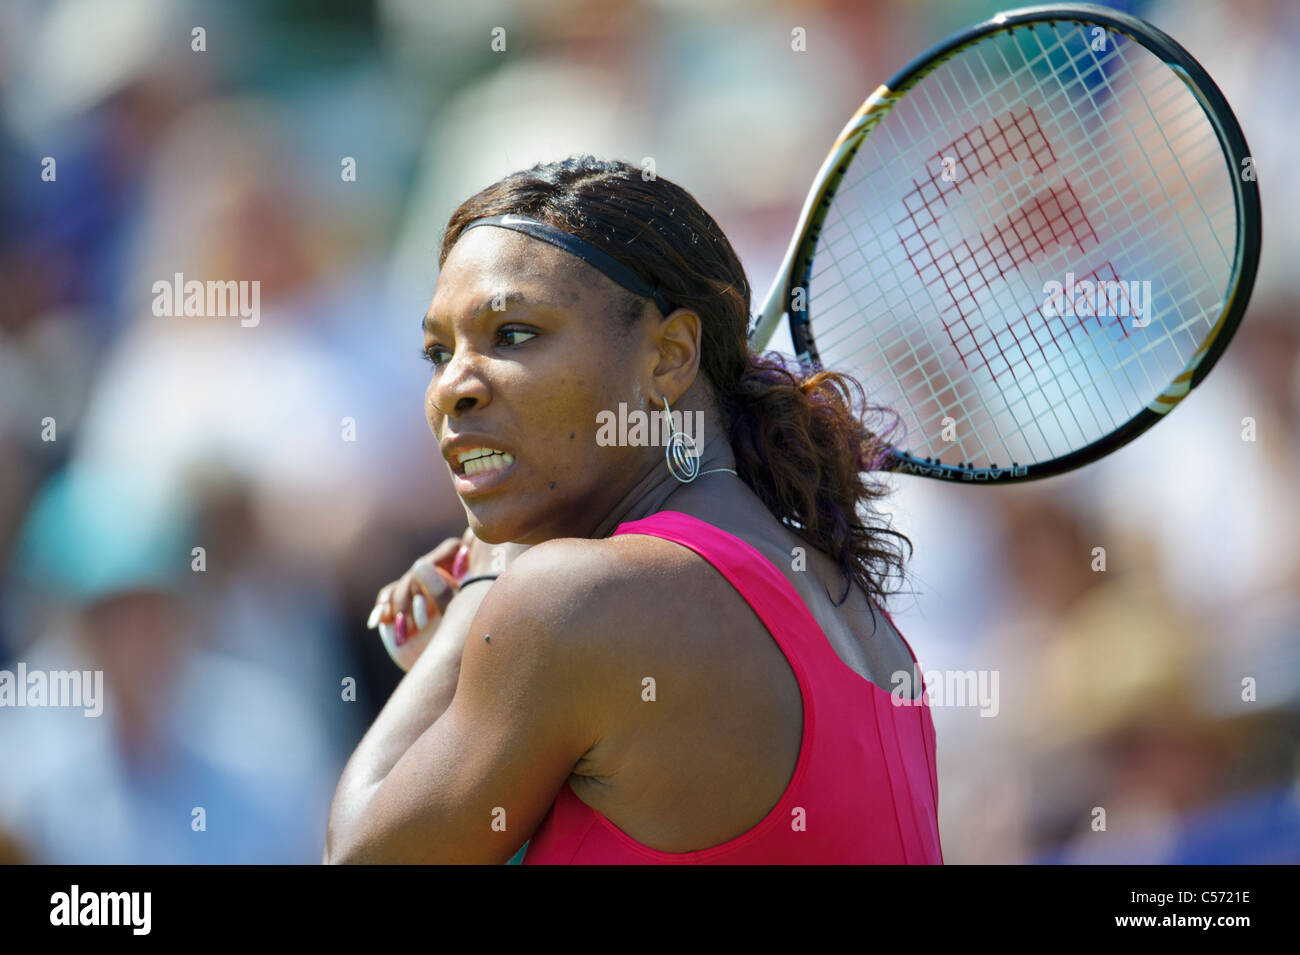 Aegon International tennis tournament, Eastbourne 2011, East Sussex. Serena Williams of USA. - Stock Image